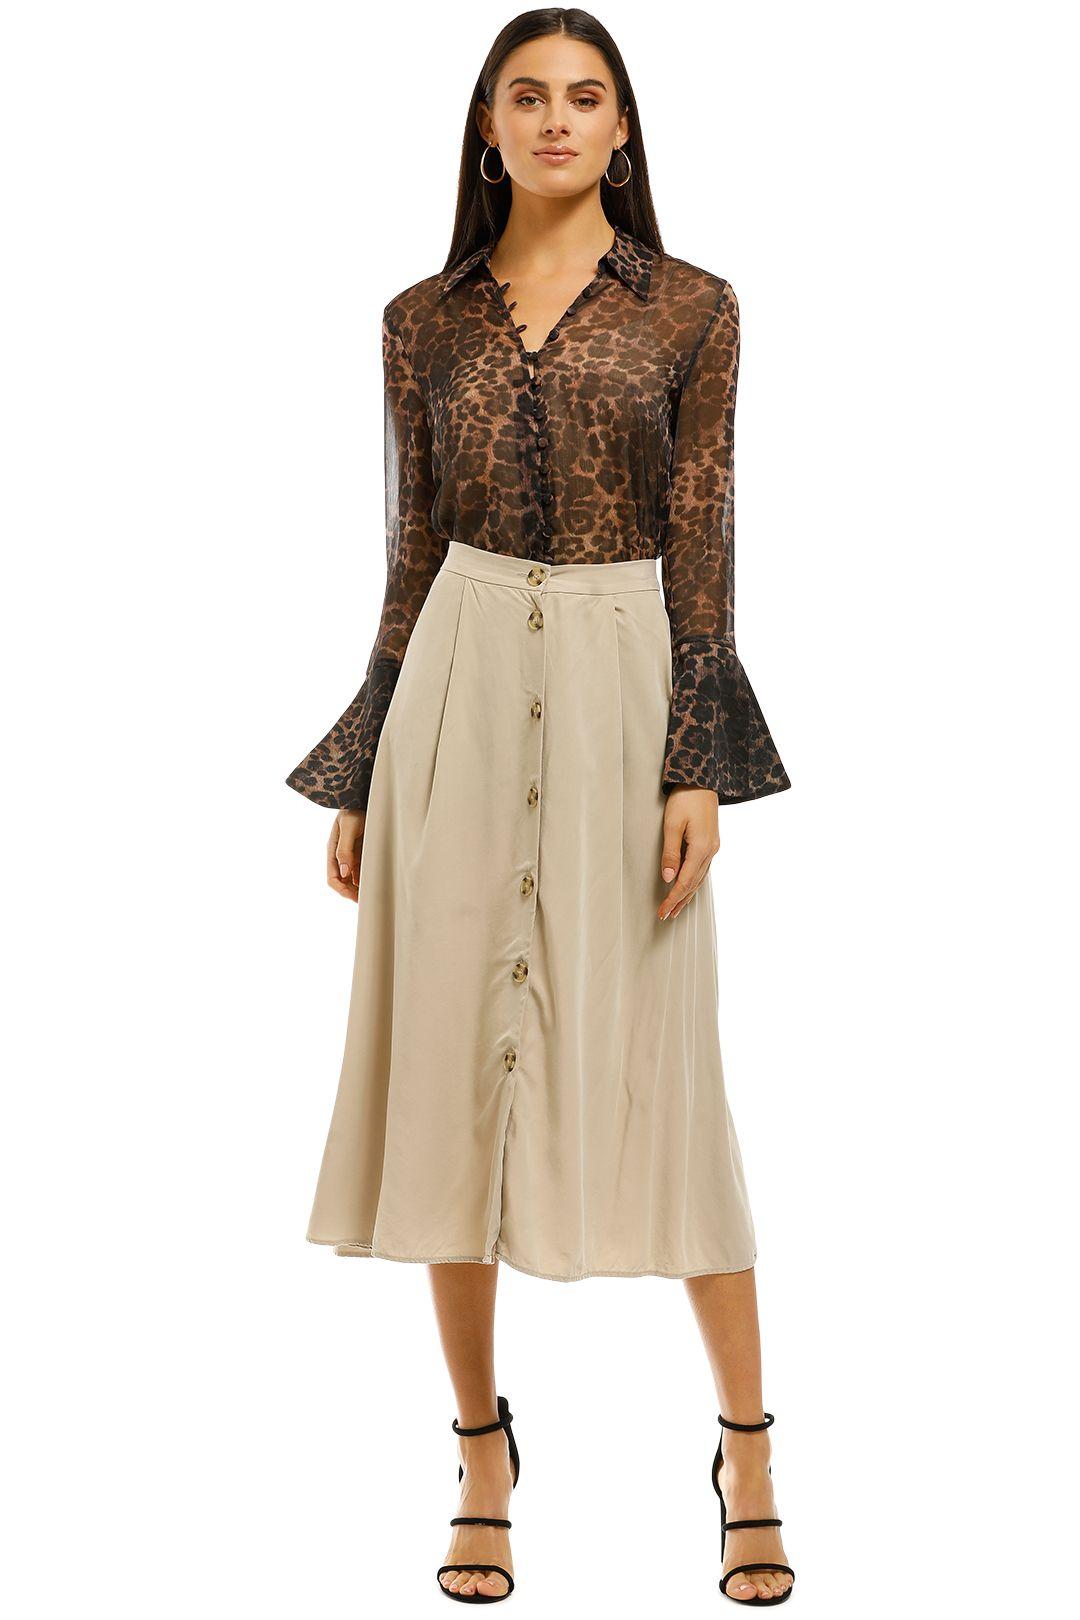 Misha-Collection-Jaimee-Shirt-Leopard-Front